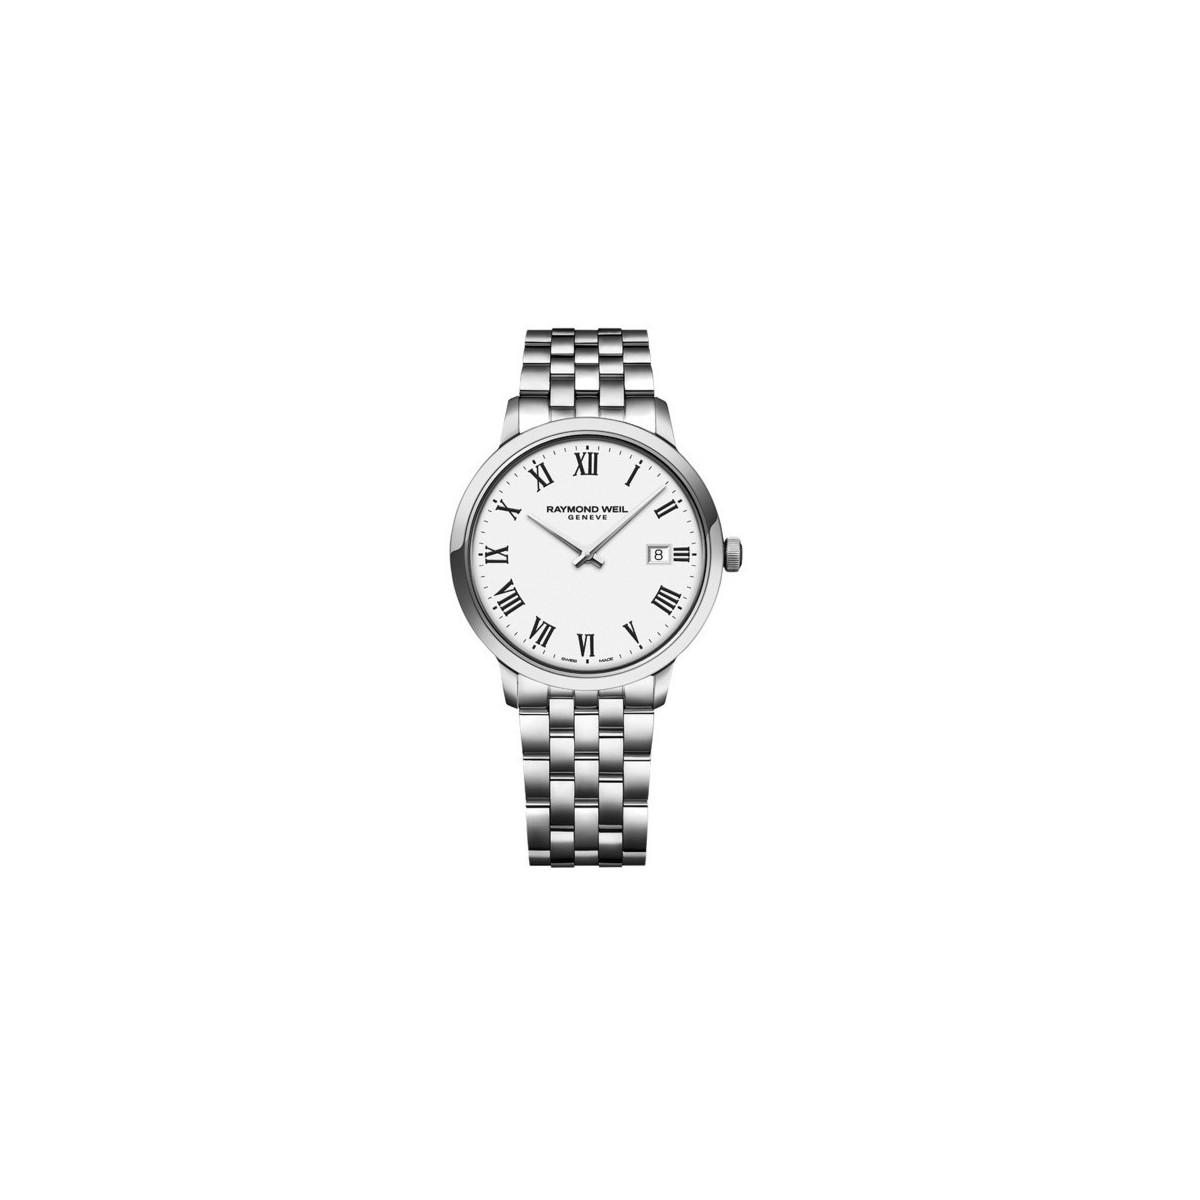 Reloj Raymond Weil Toccata Hombre 5485-ST-00300